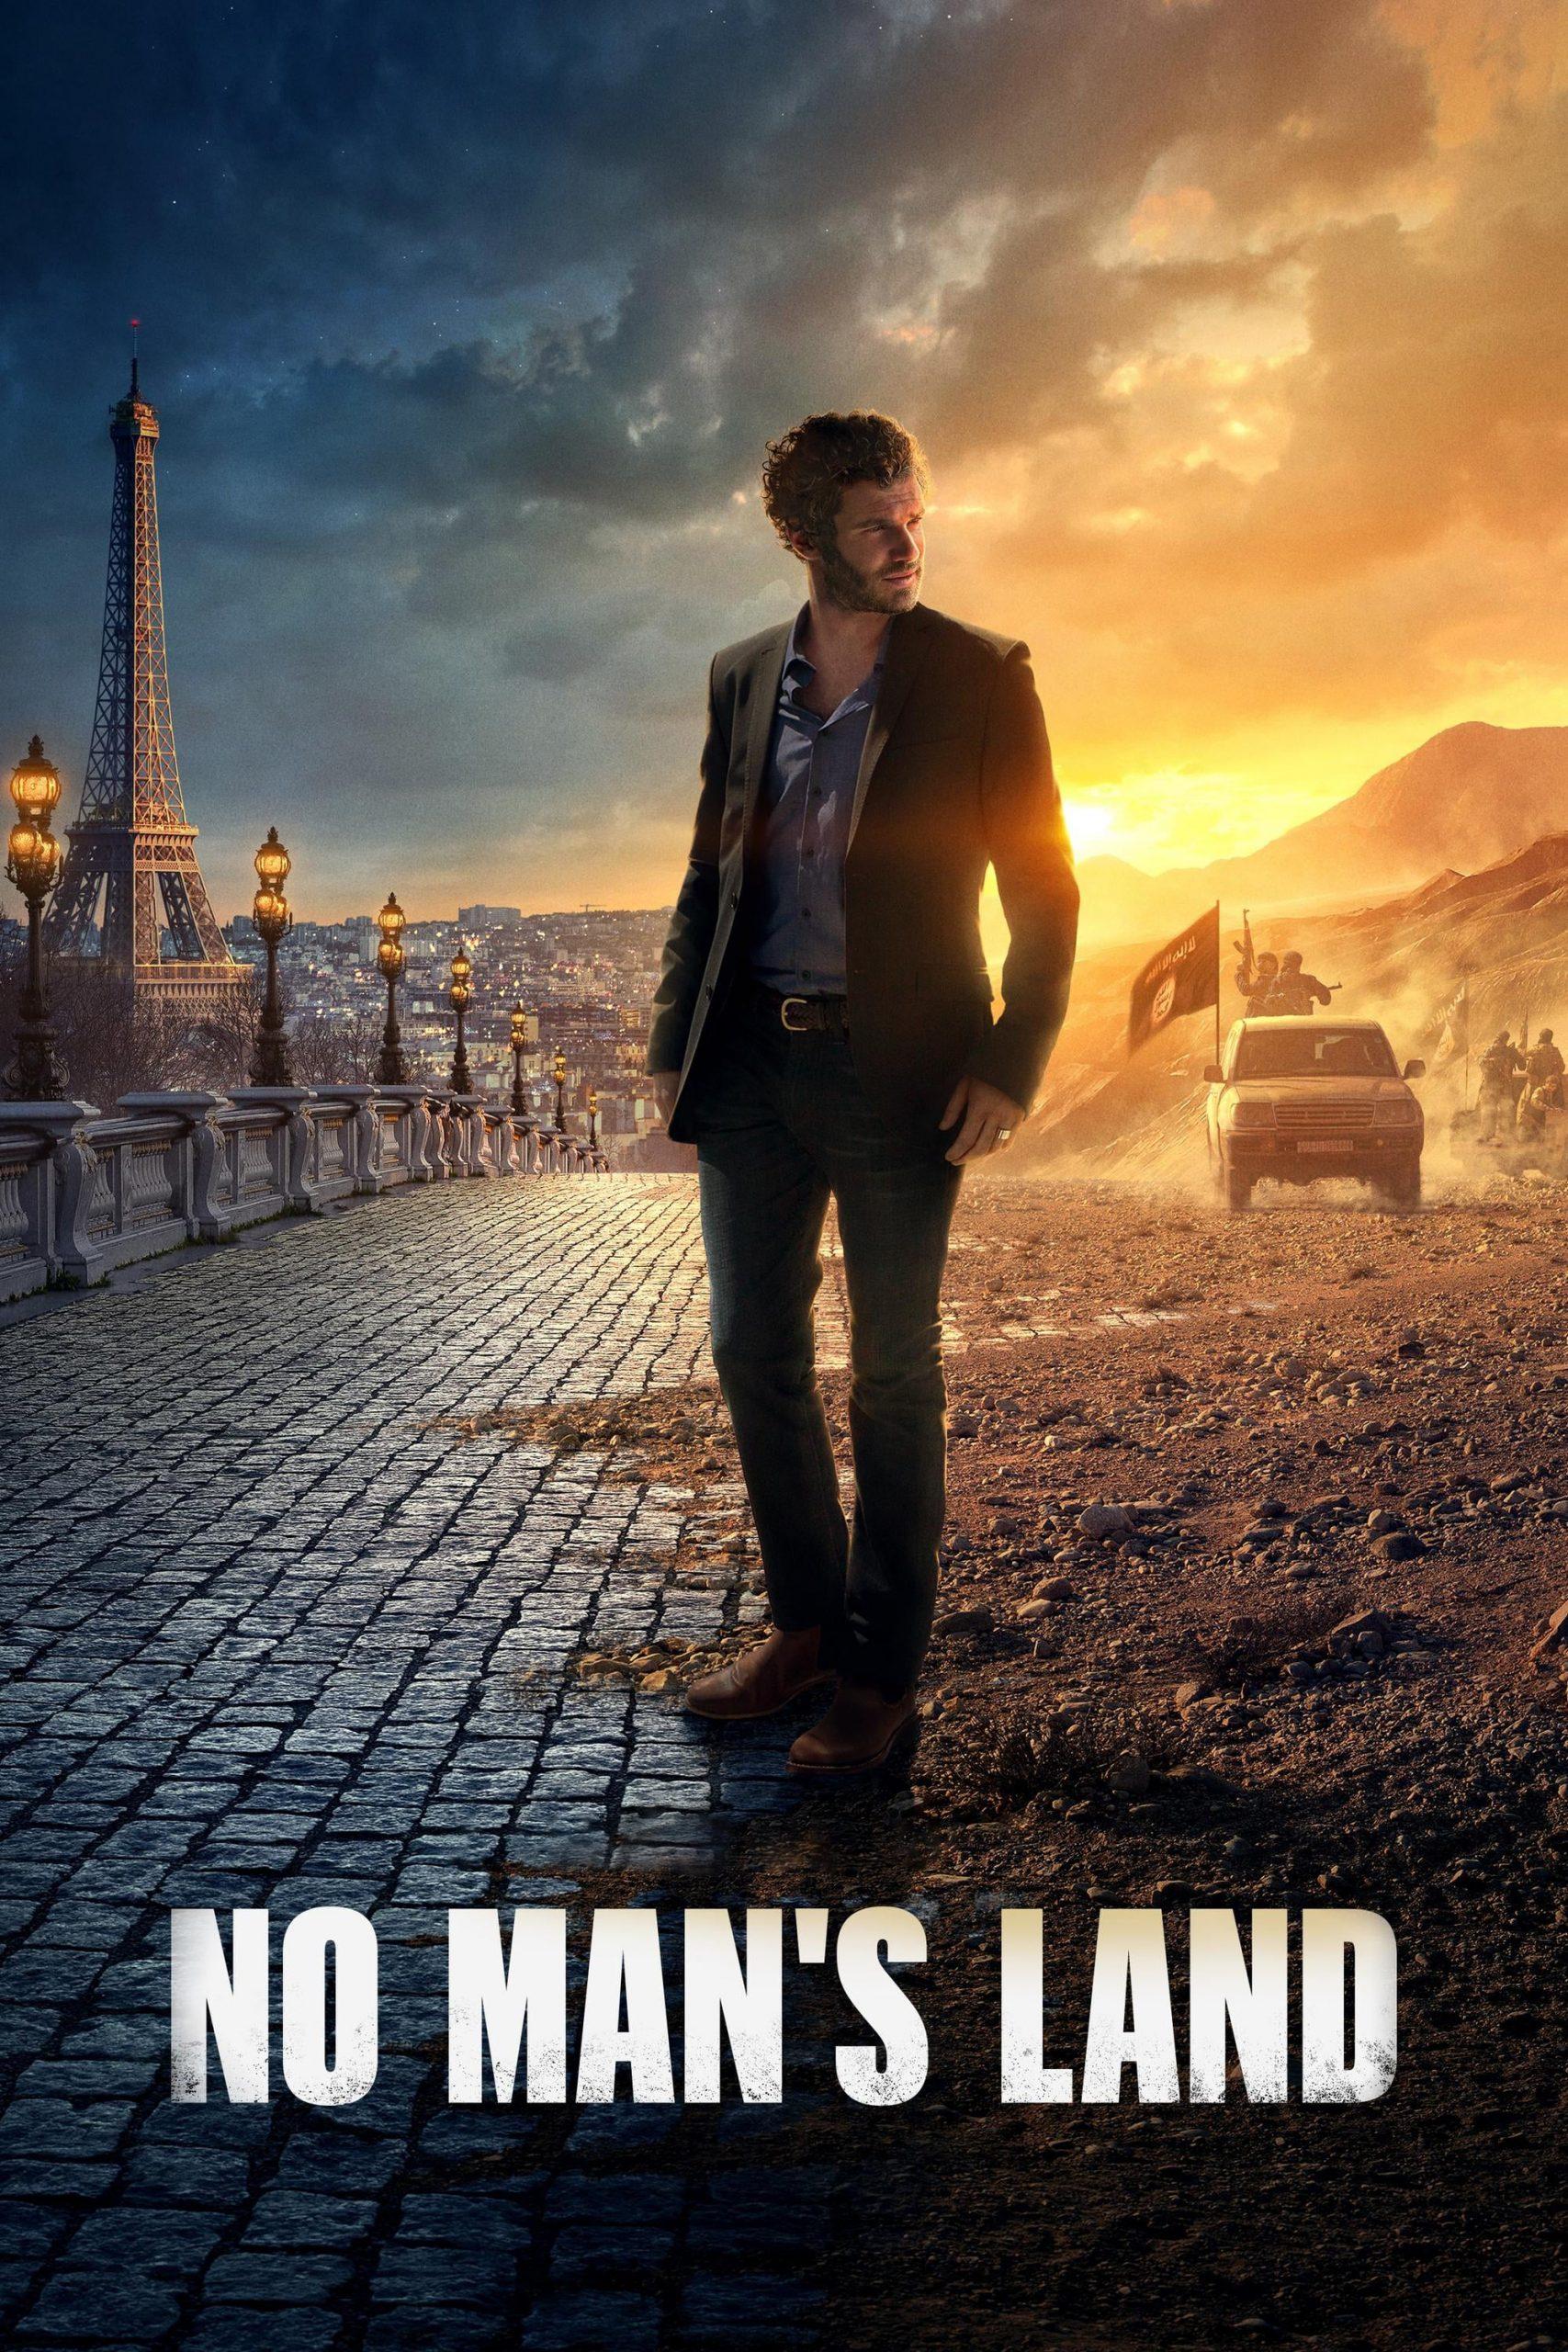 دانلود سریال No Man's Land